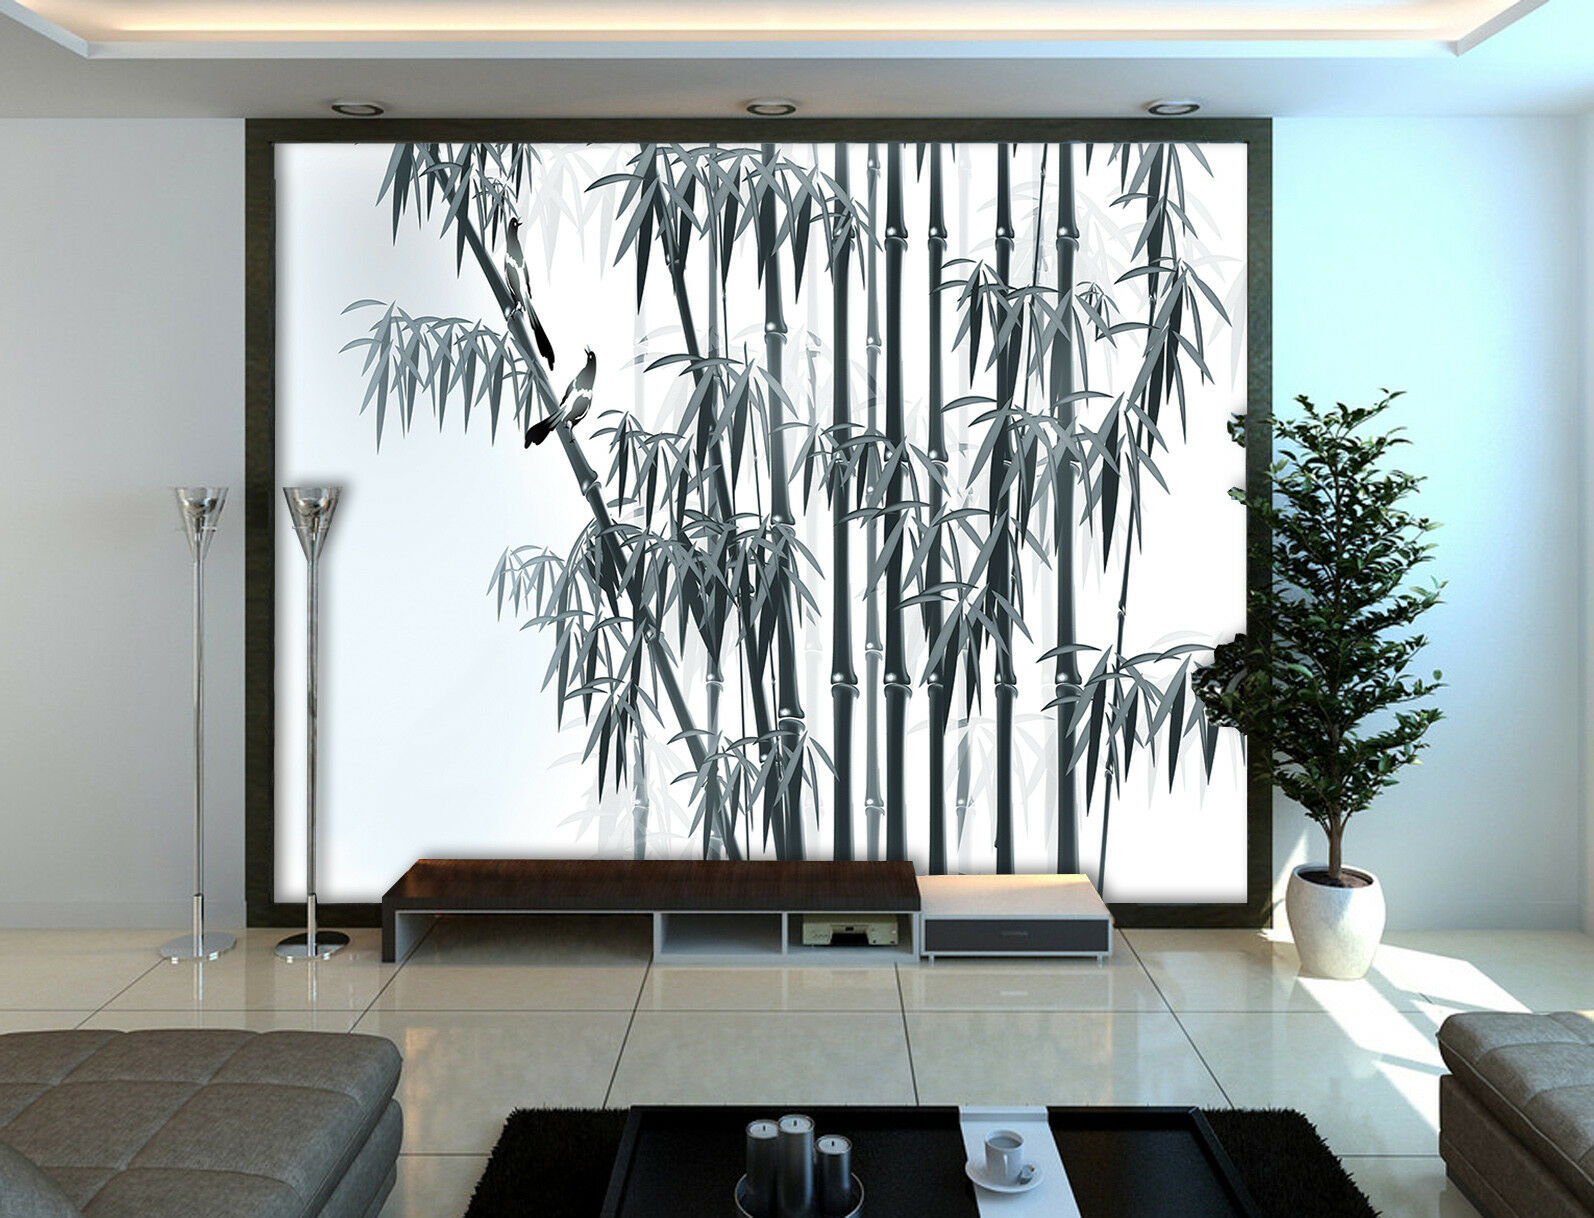 3D Bamboo Leaves 6 Wallpaper Murals Wall Print Wallpaper Mural AJ WALLPAPER UK